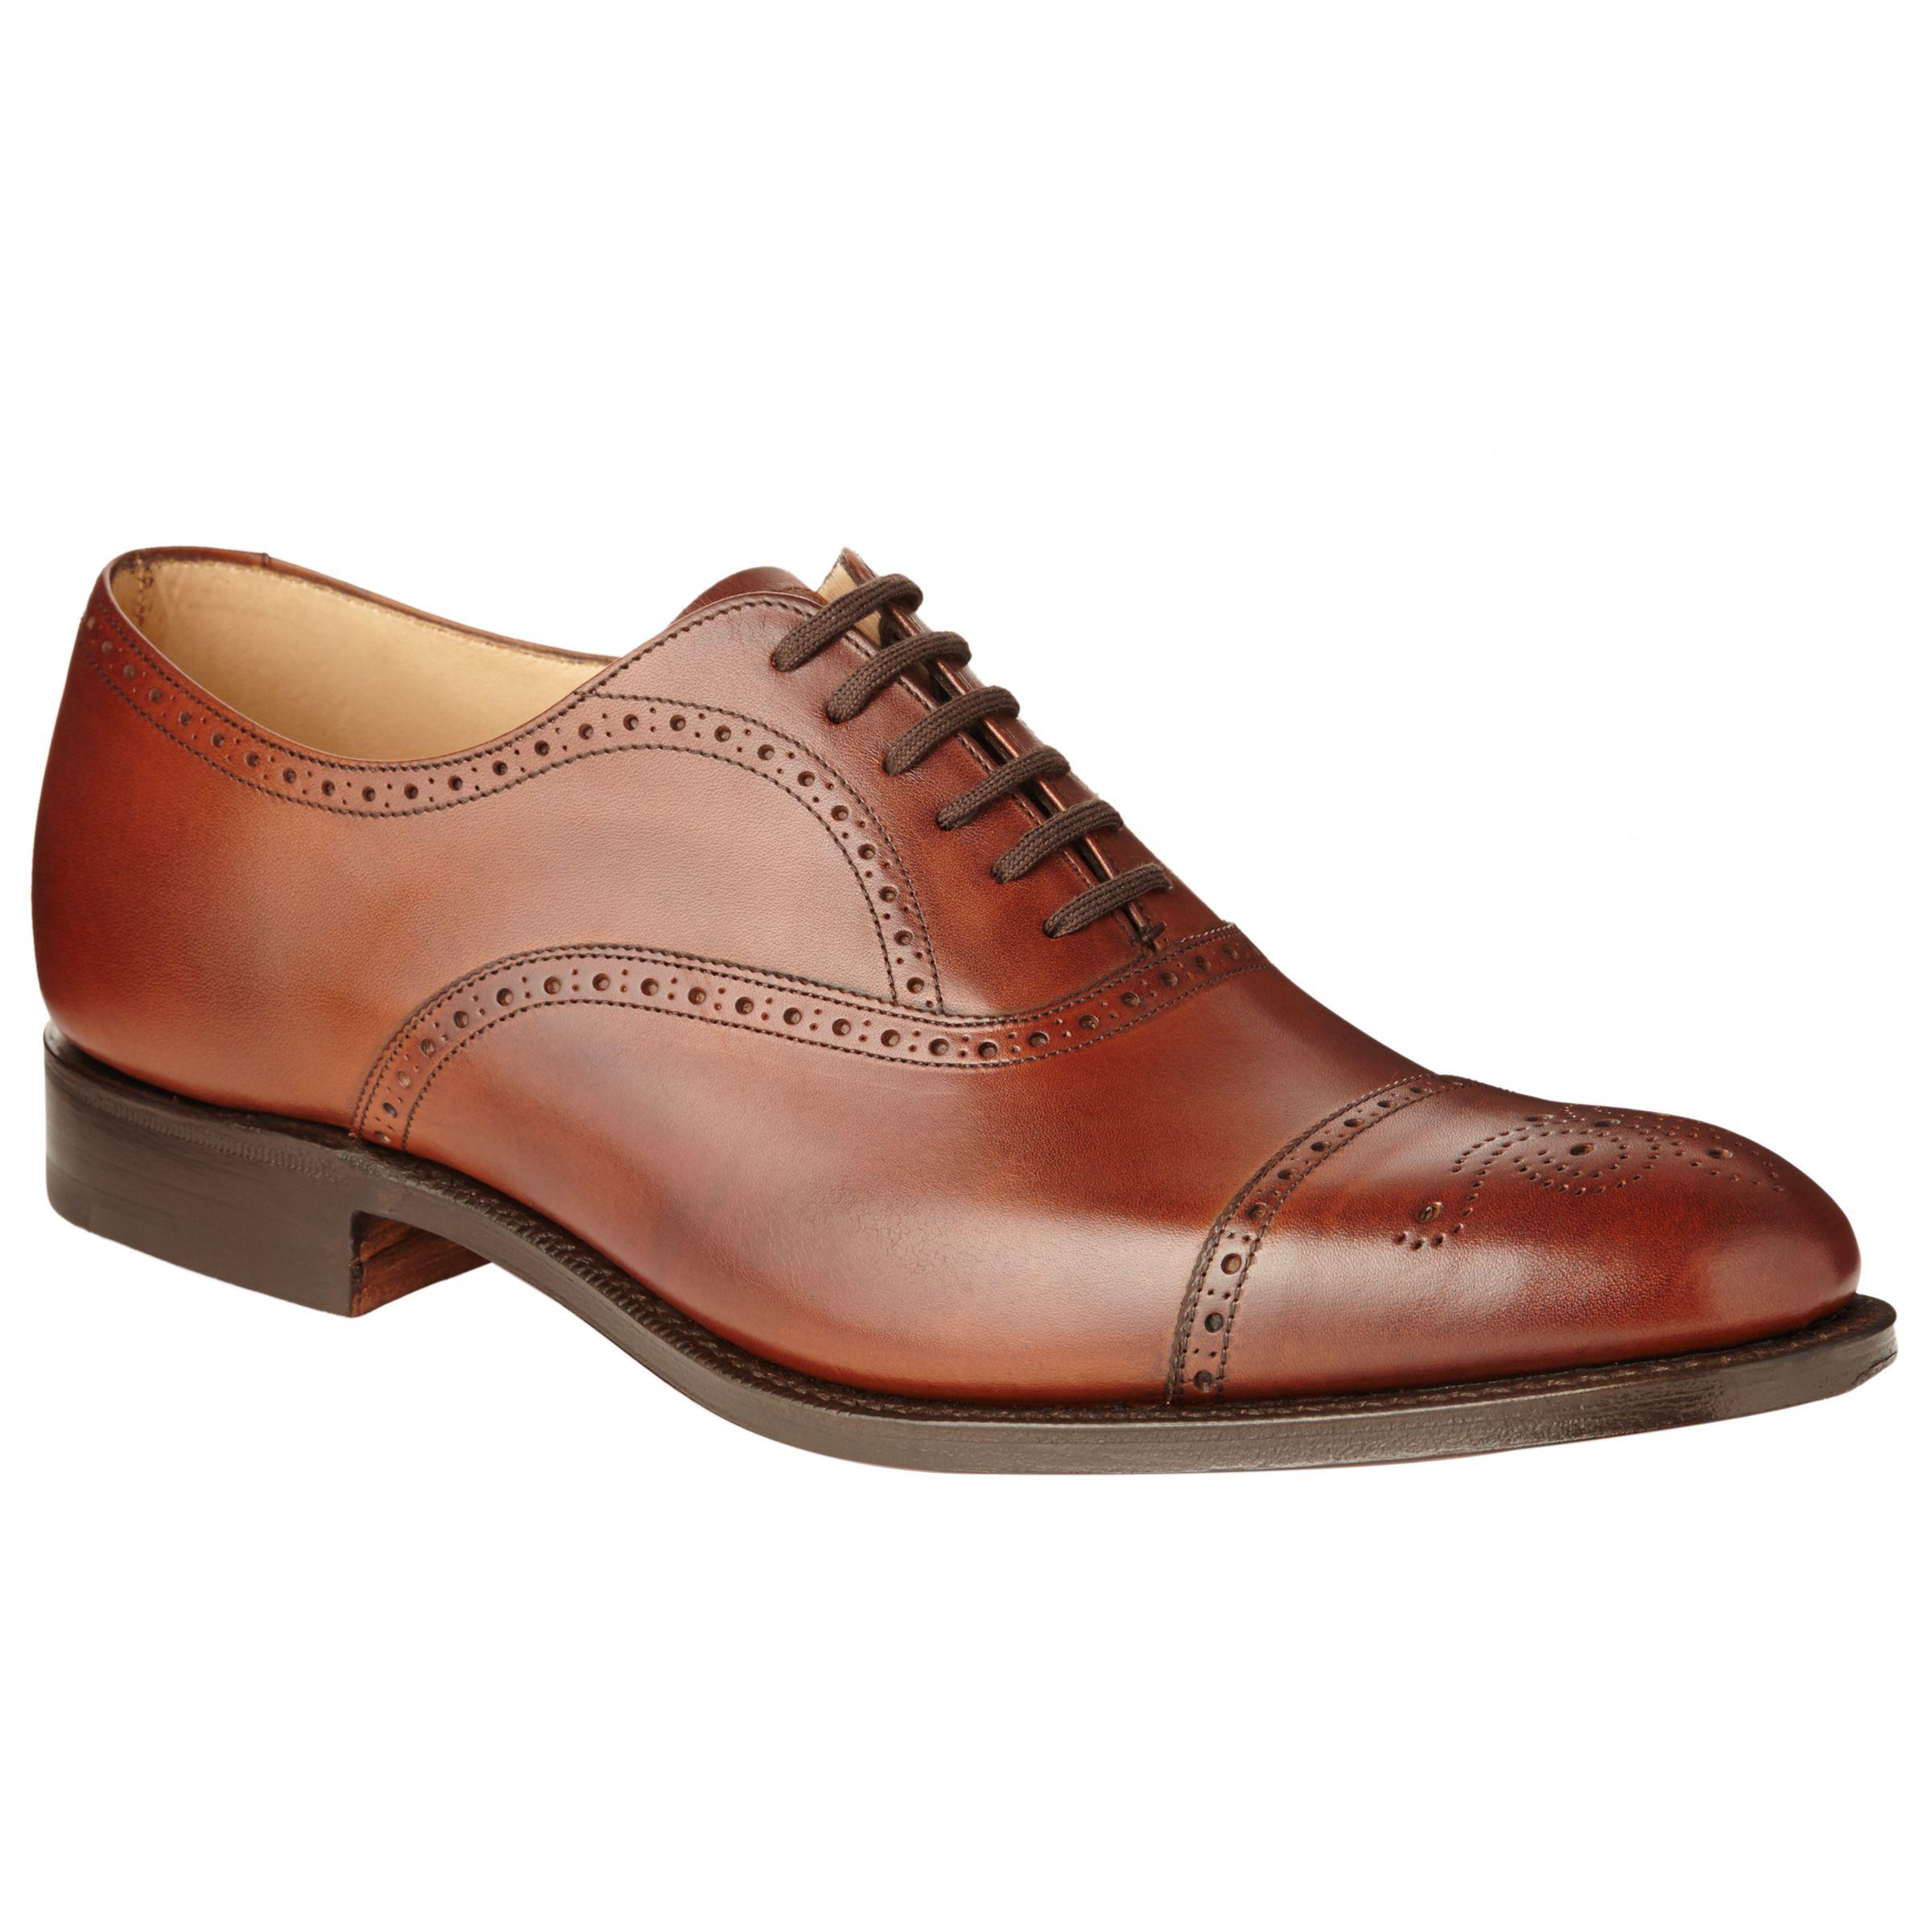 Church's Church's Toronto Leather Semi Brogue Oxford Shoes, Walnut